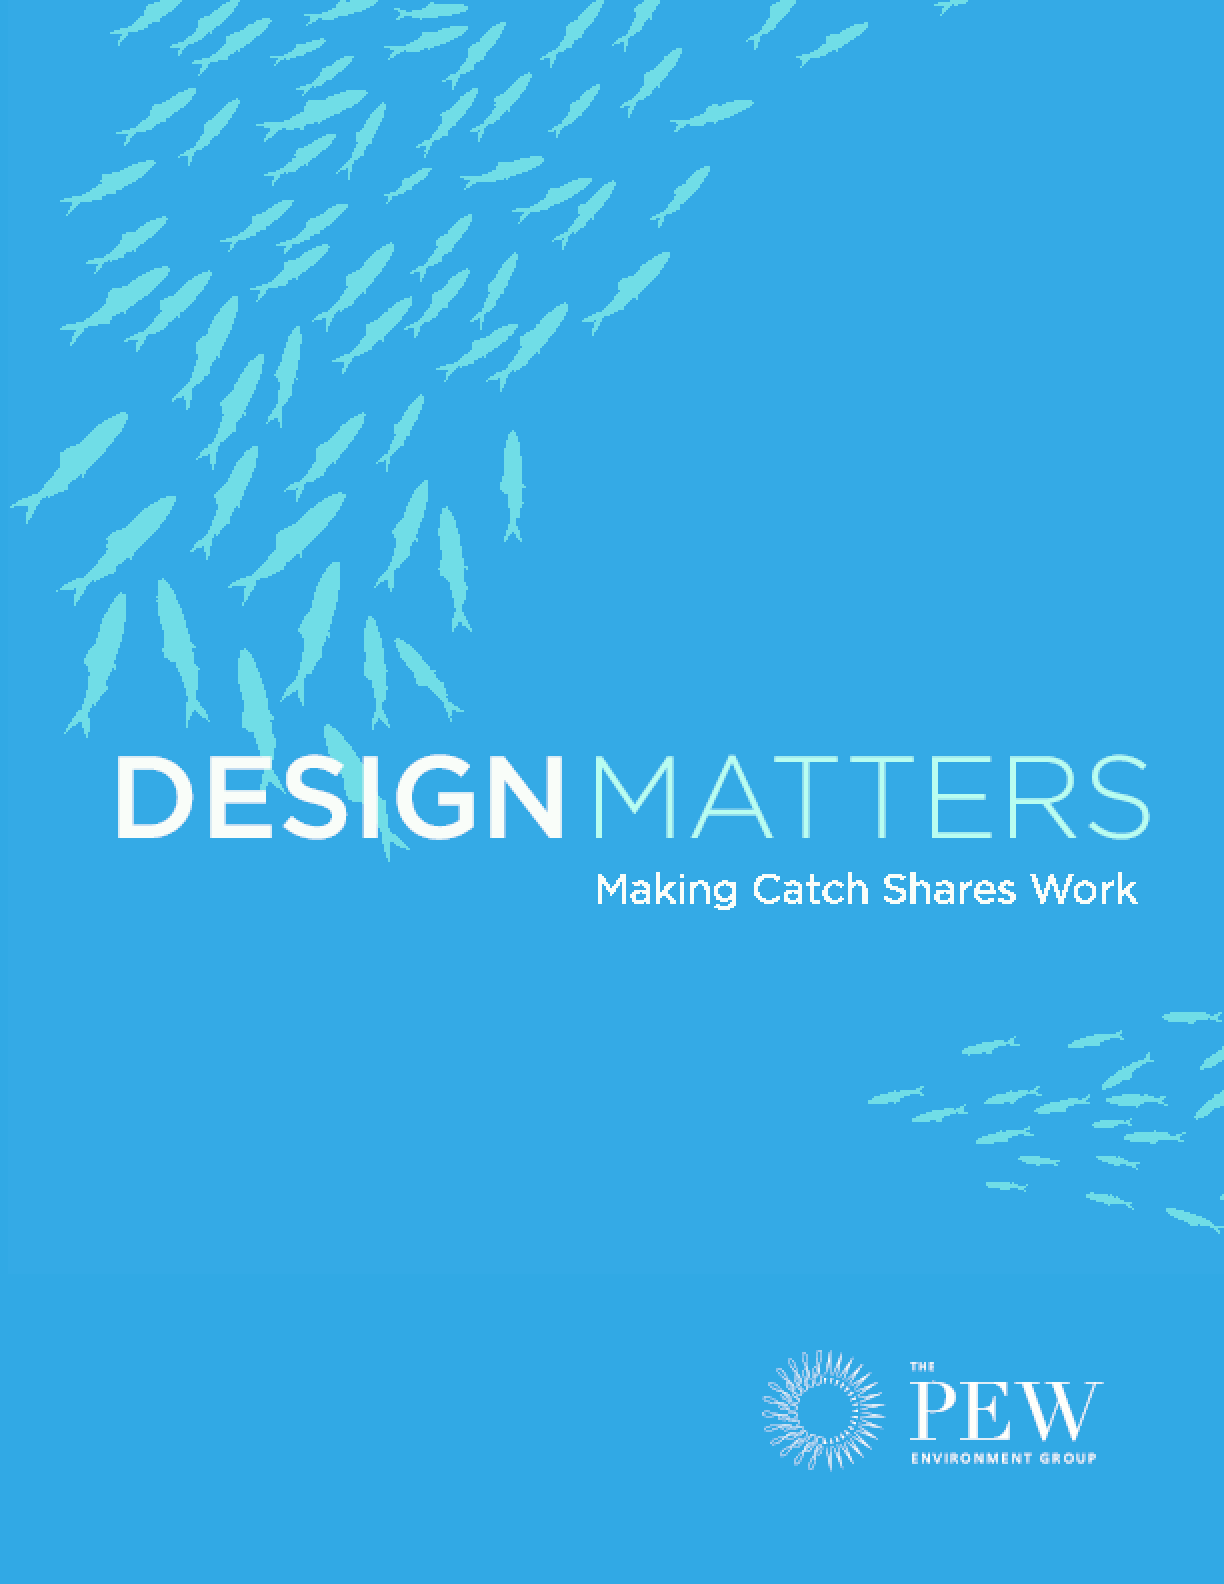 Design Matters: Making Catch Shares Work